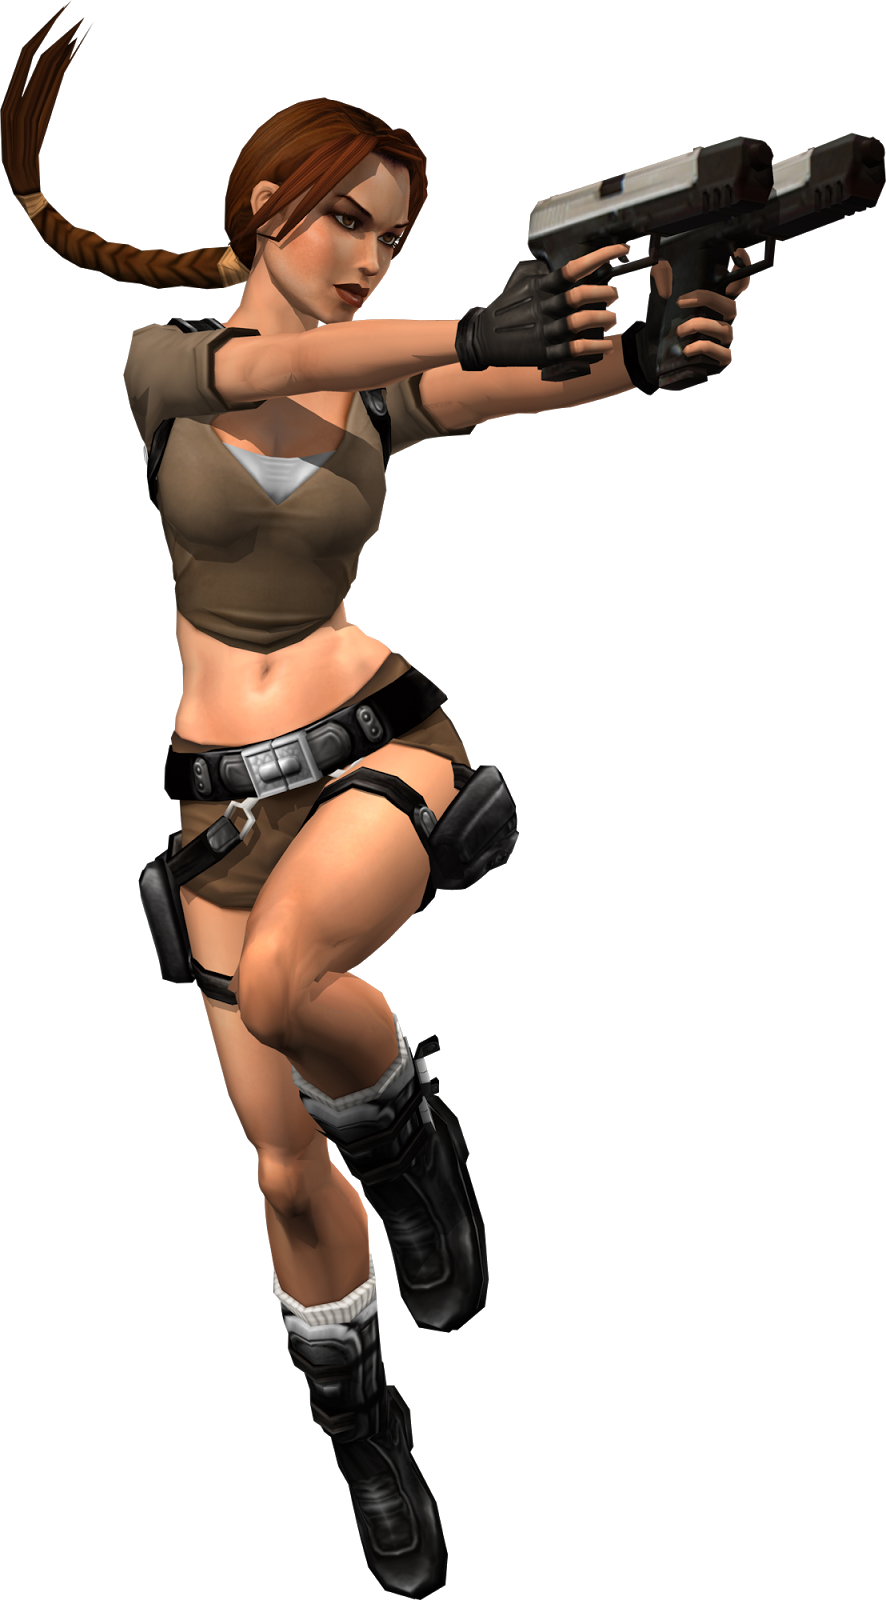 Lara Croft |  Tomb Raider  With Guns